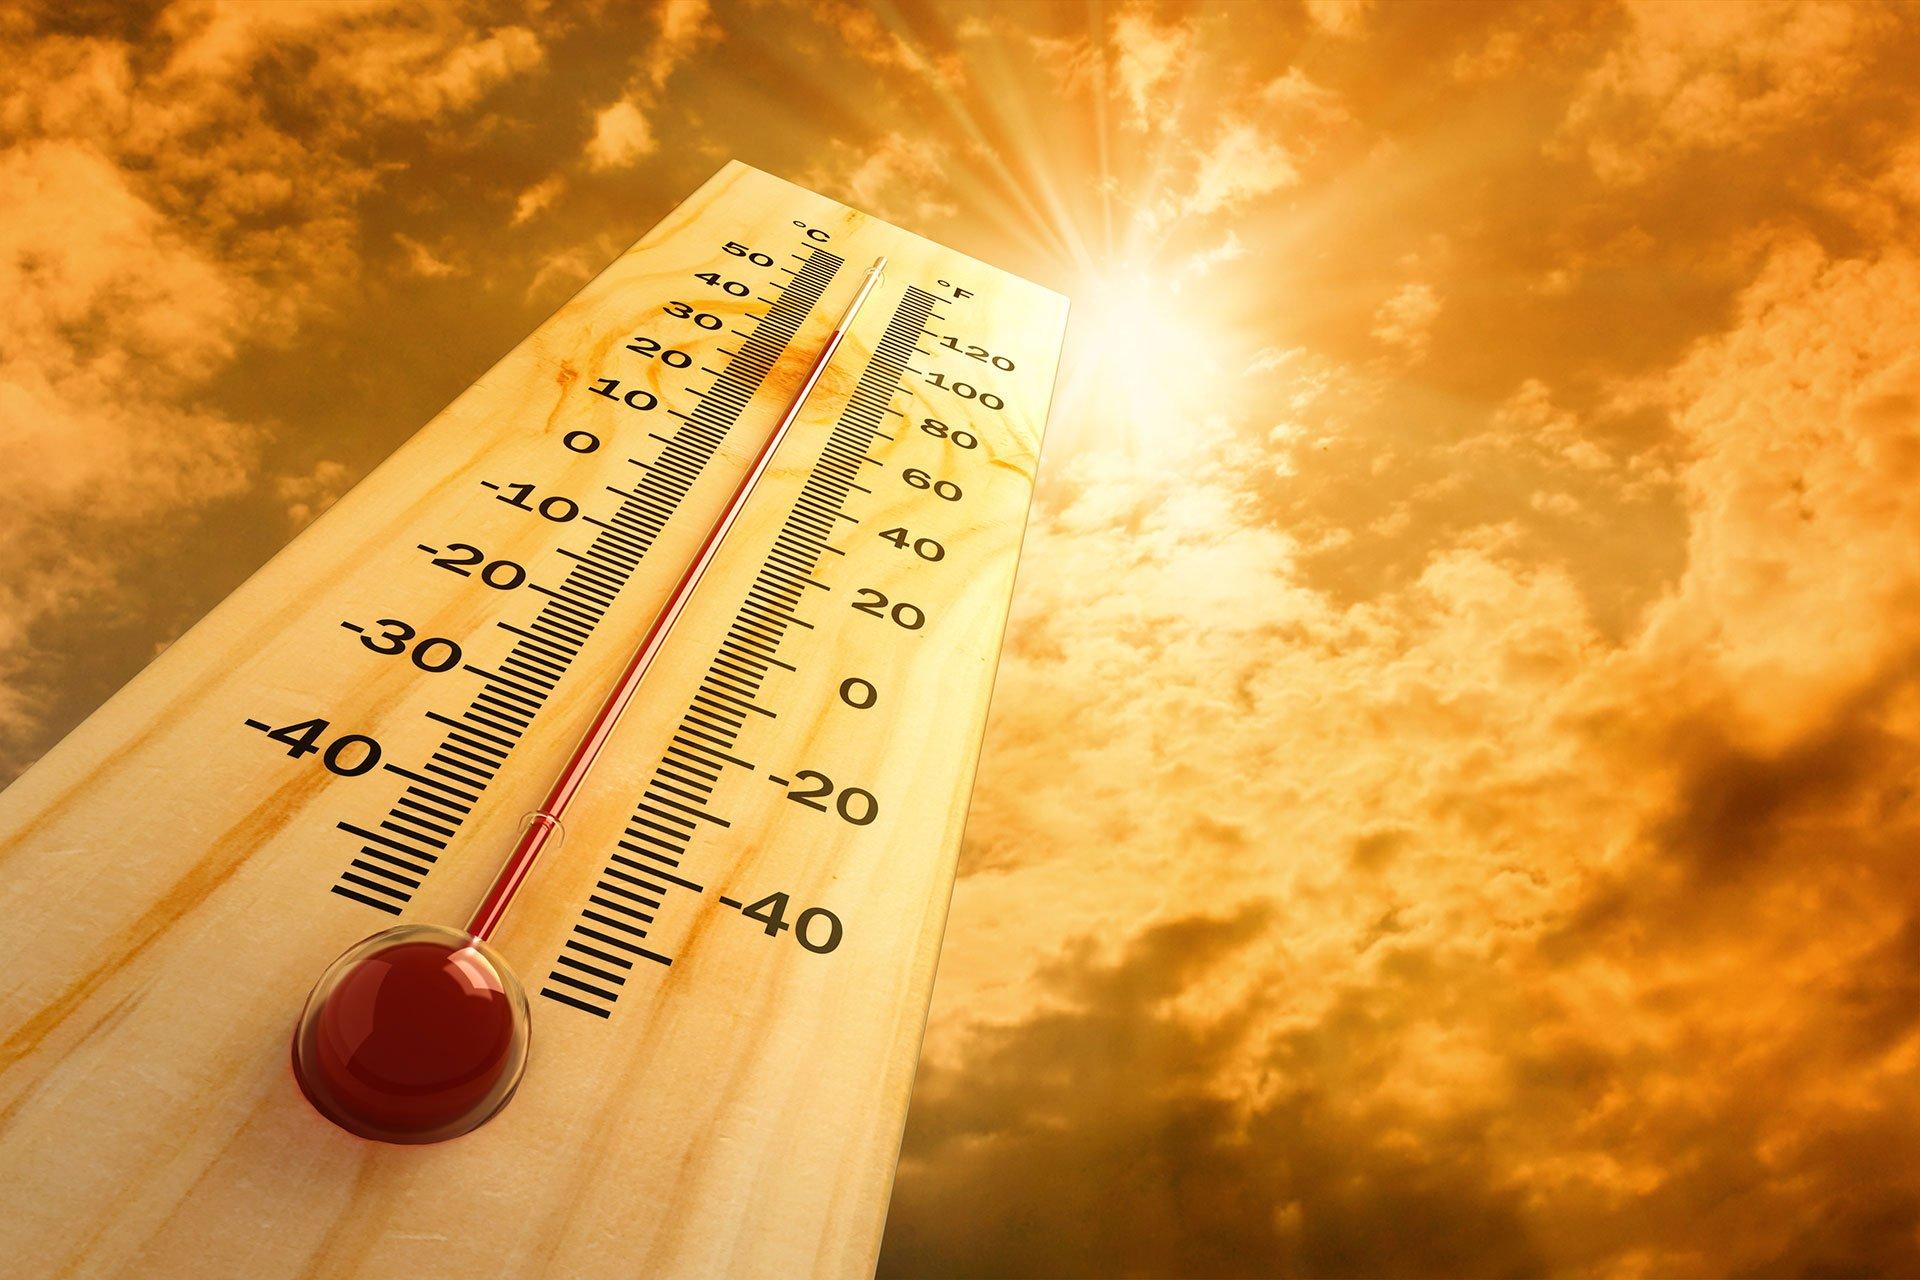 bring the heat visaudio designs